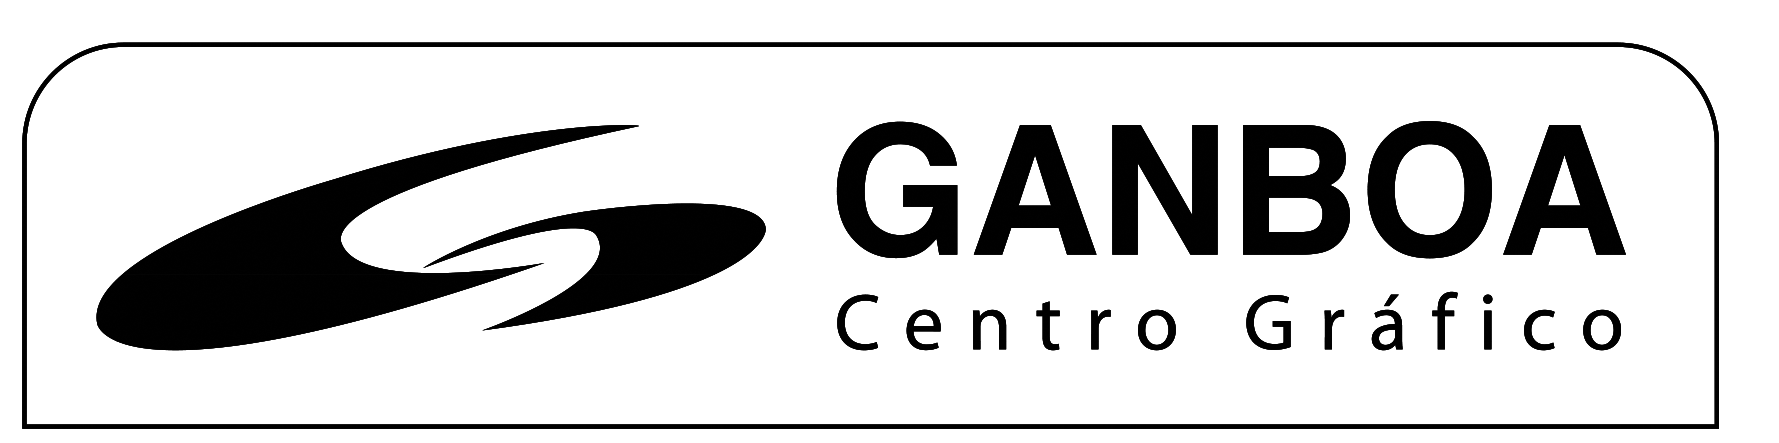 ganboa